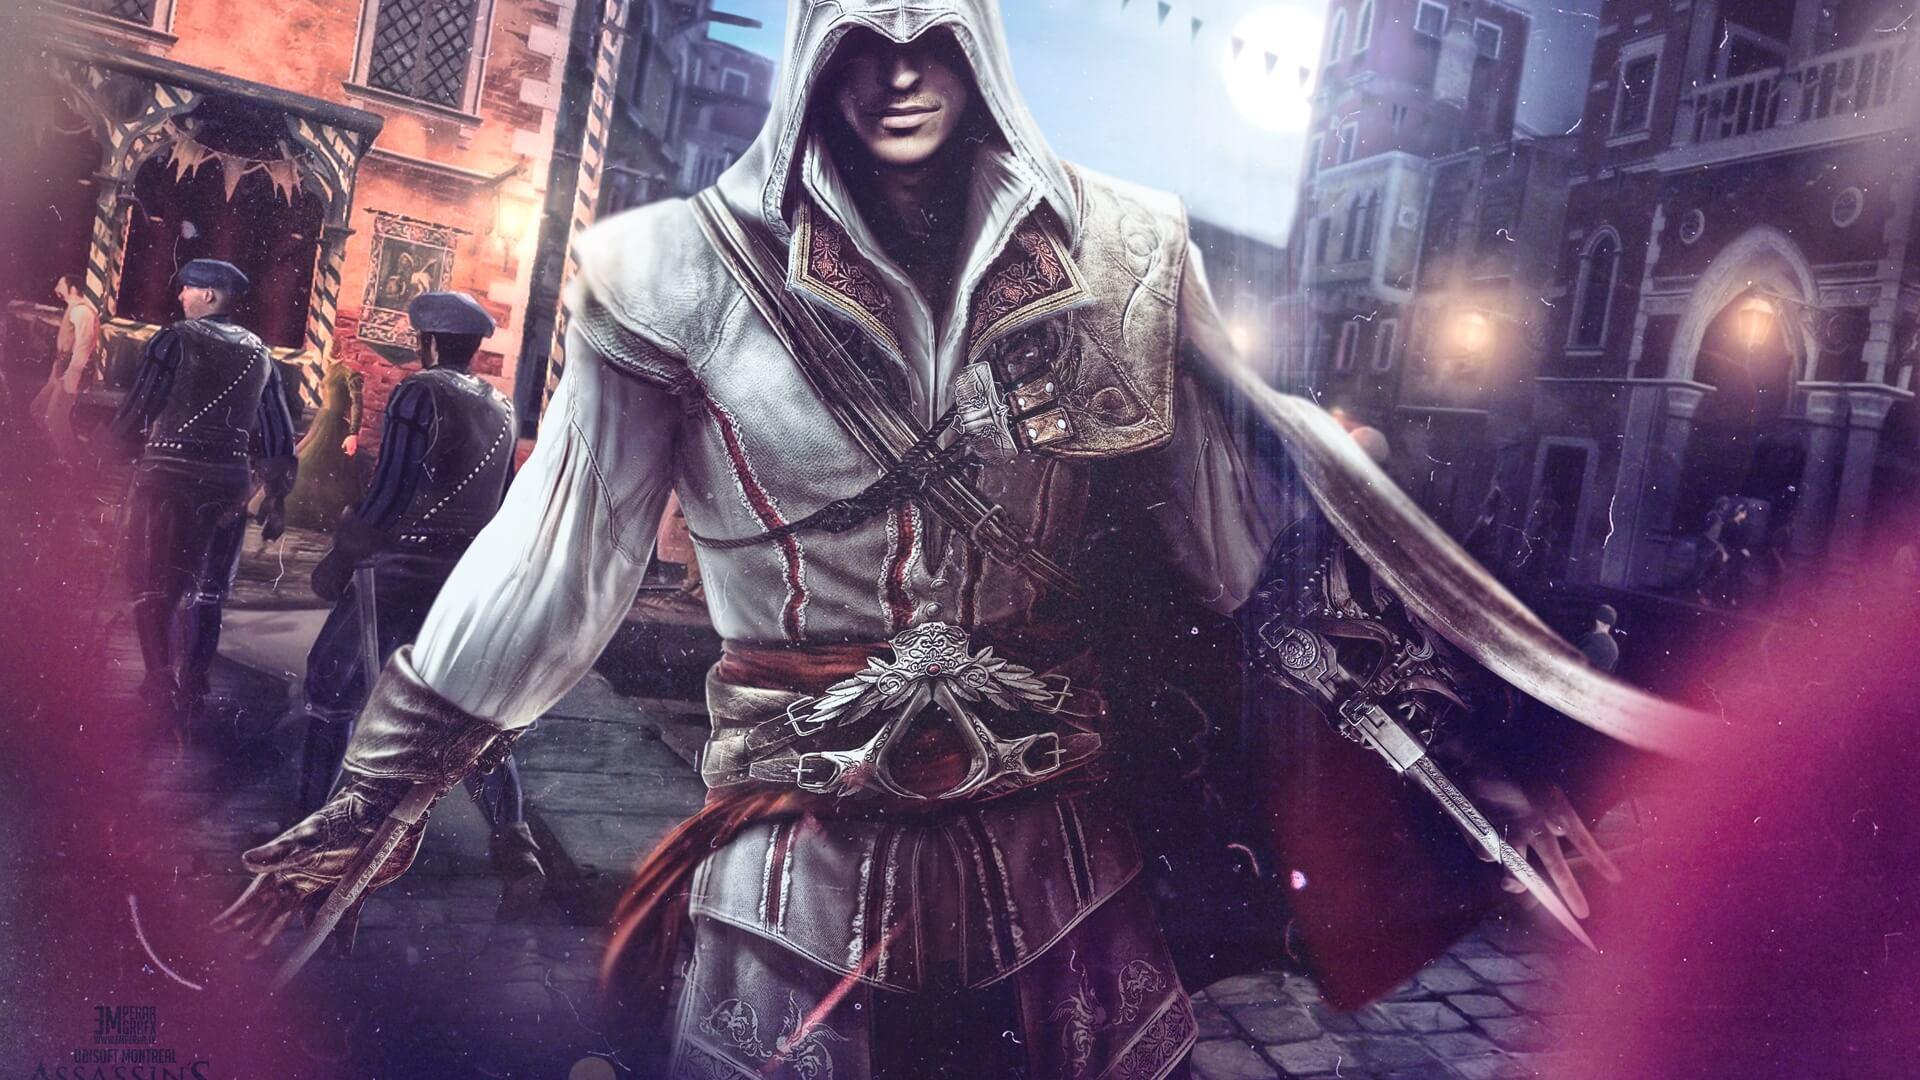 Обои и картинки Assassins creed на рабочий стол - подборка 18